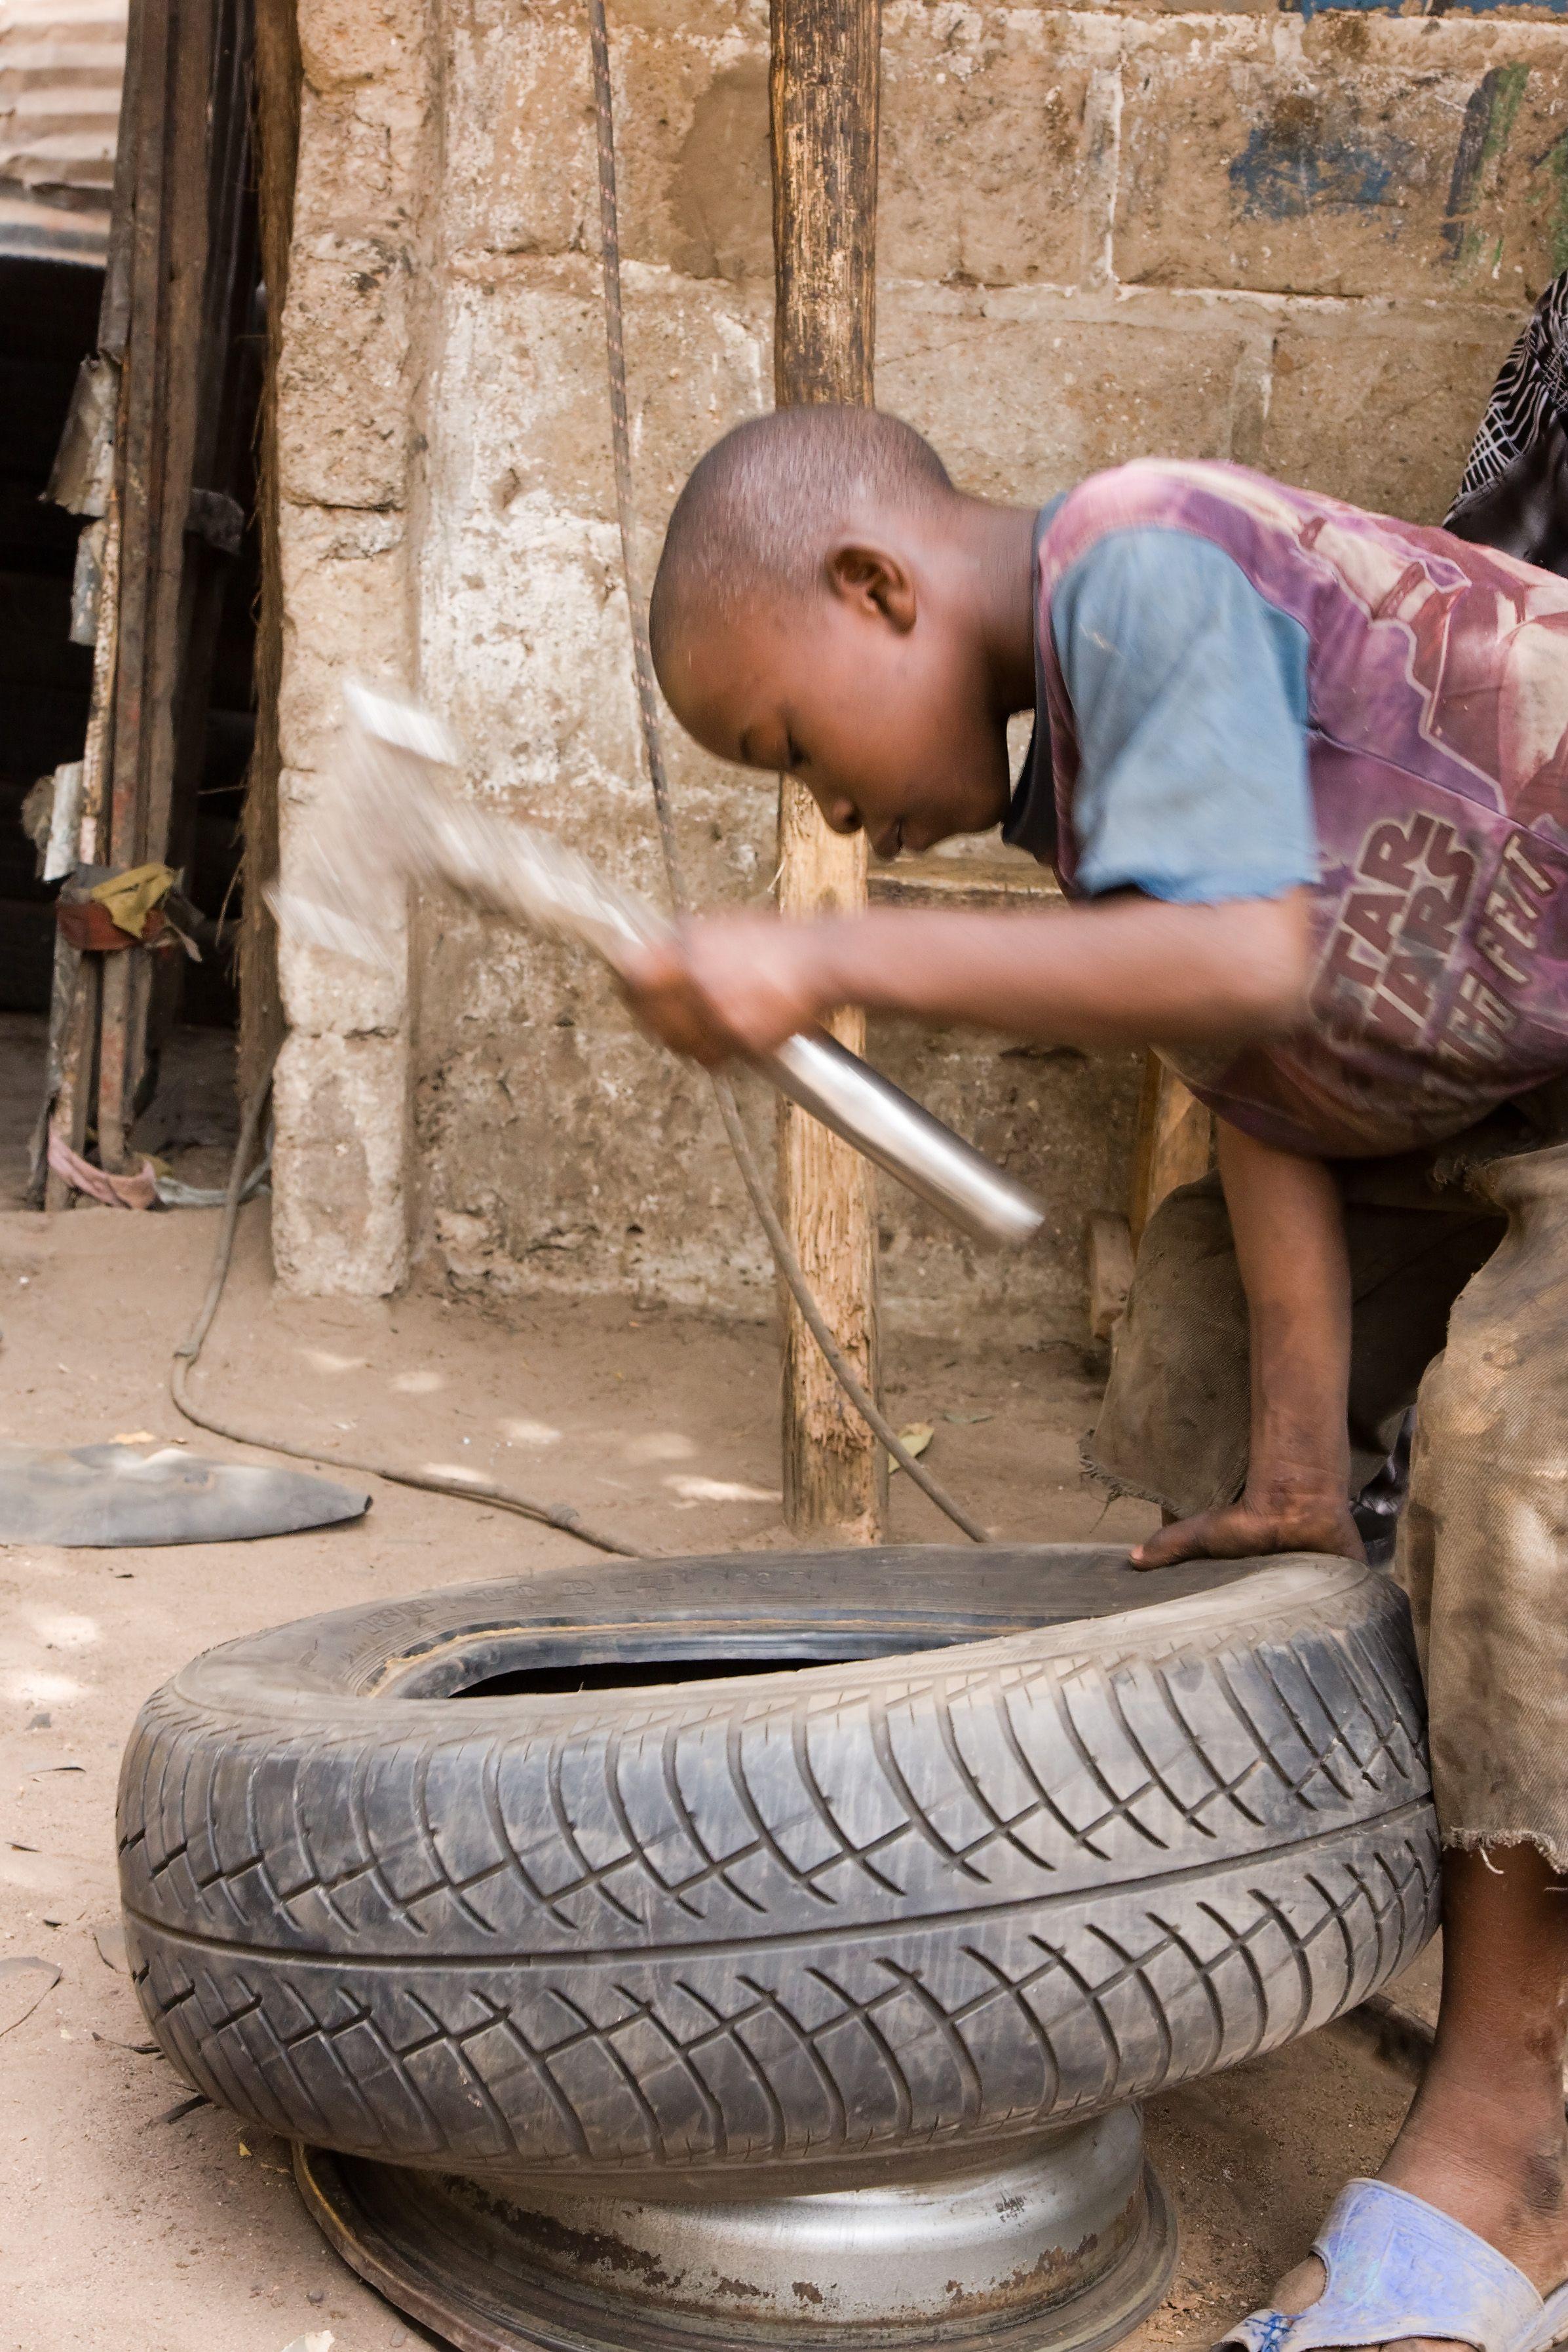 child labour essay hindi clasifiedad an essay on child labour pin lorna nangle on child labour